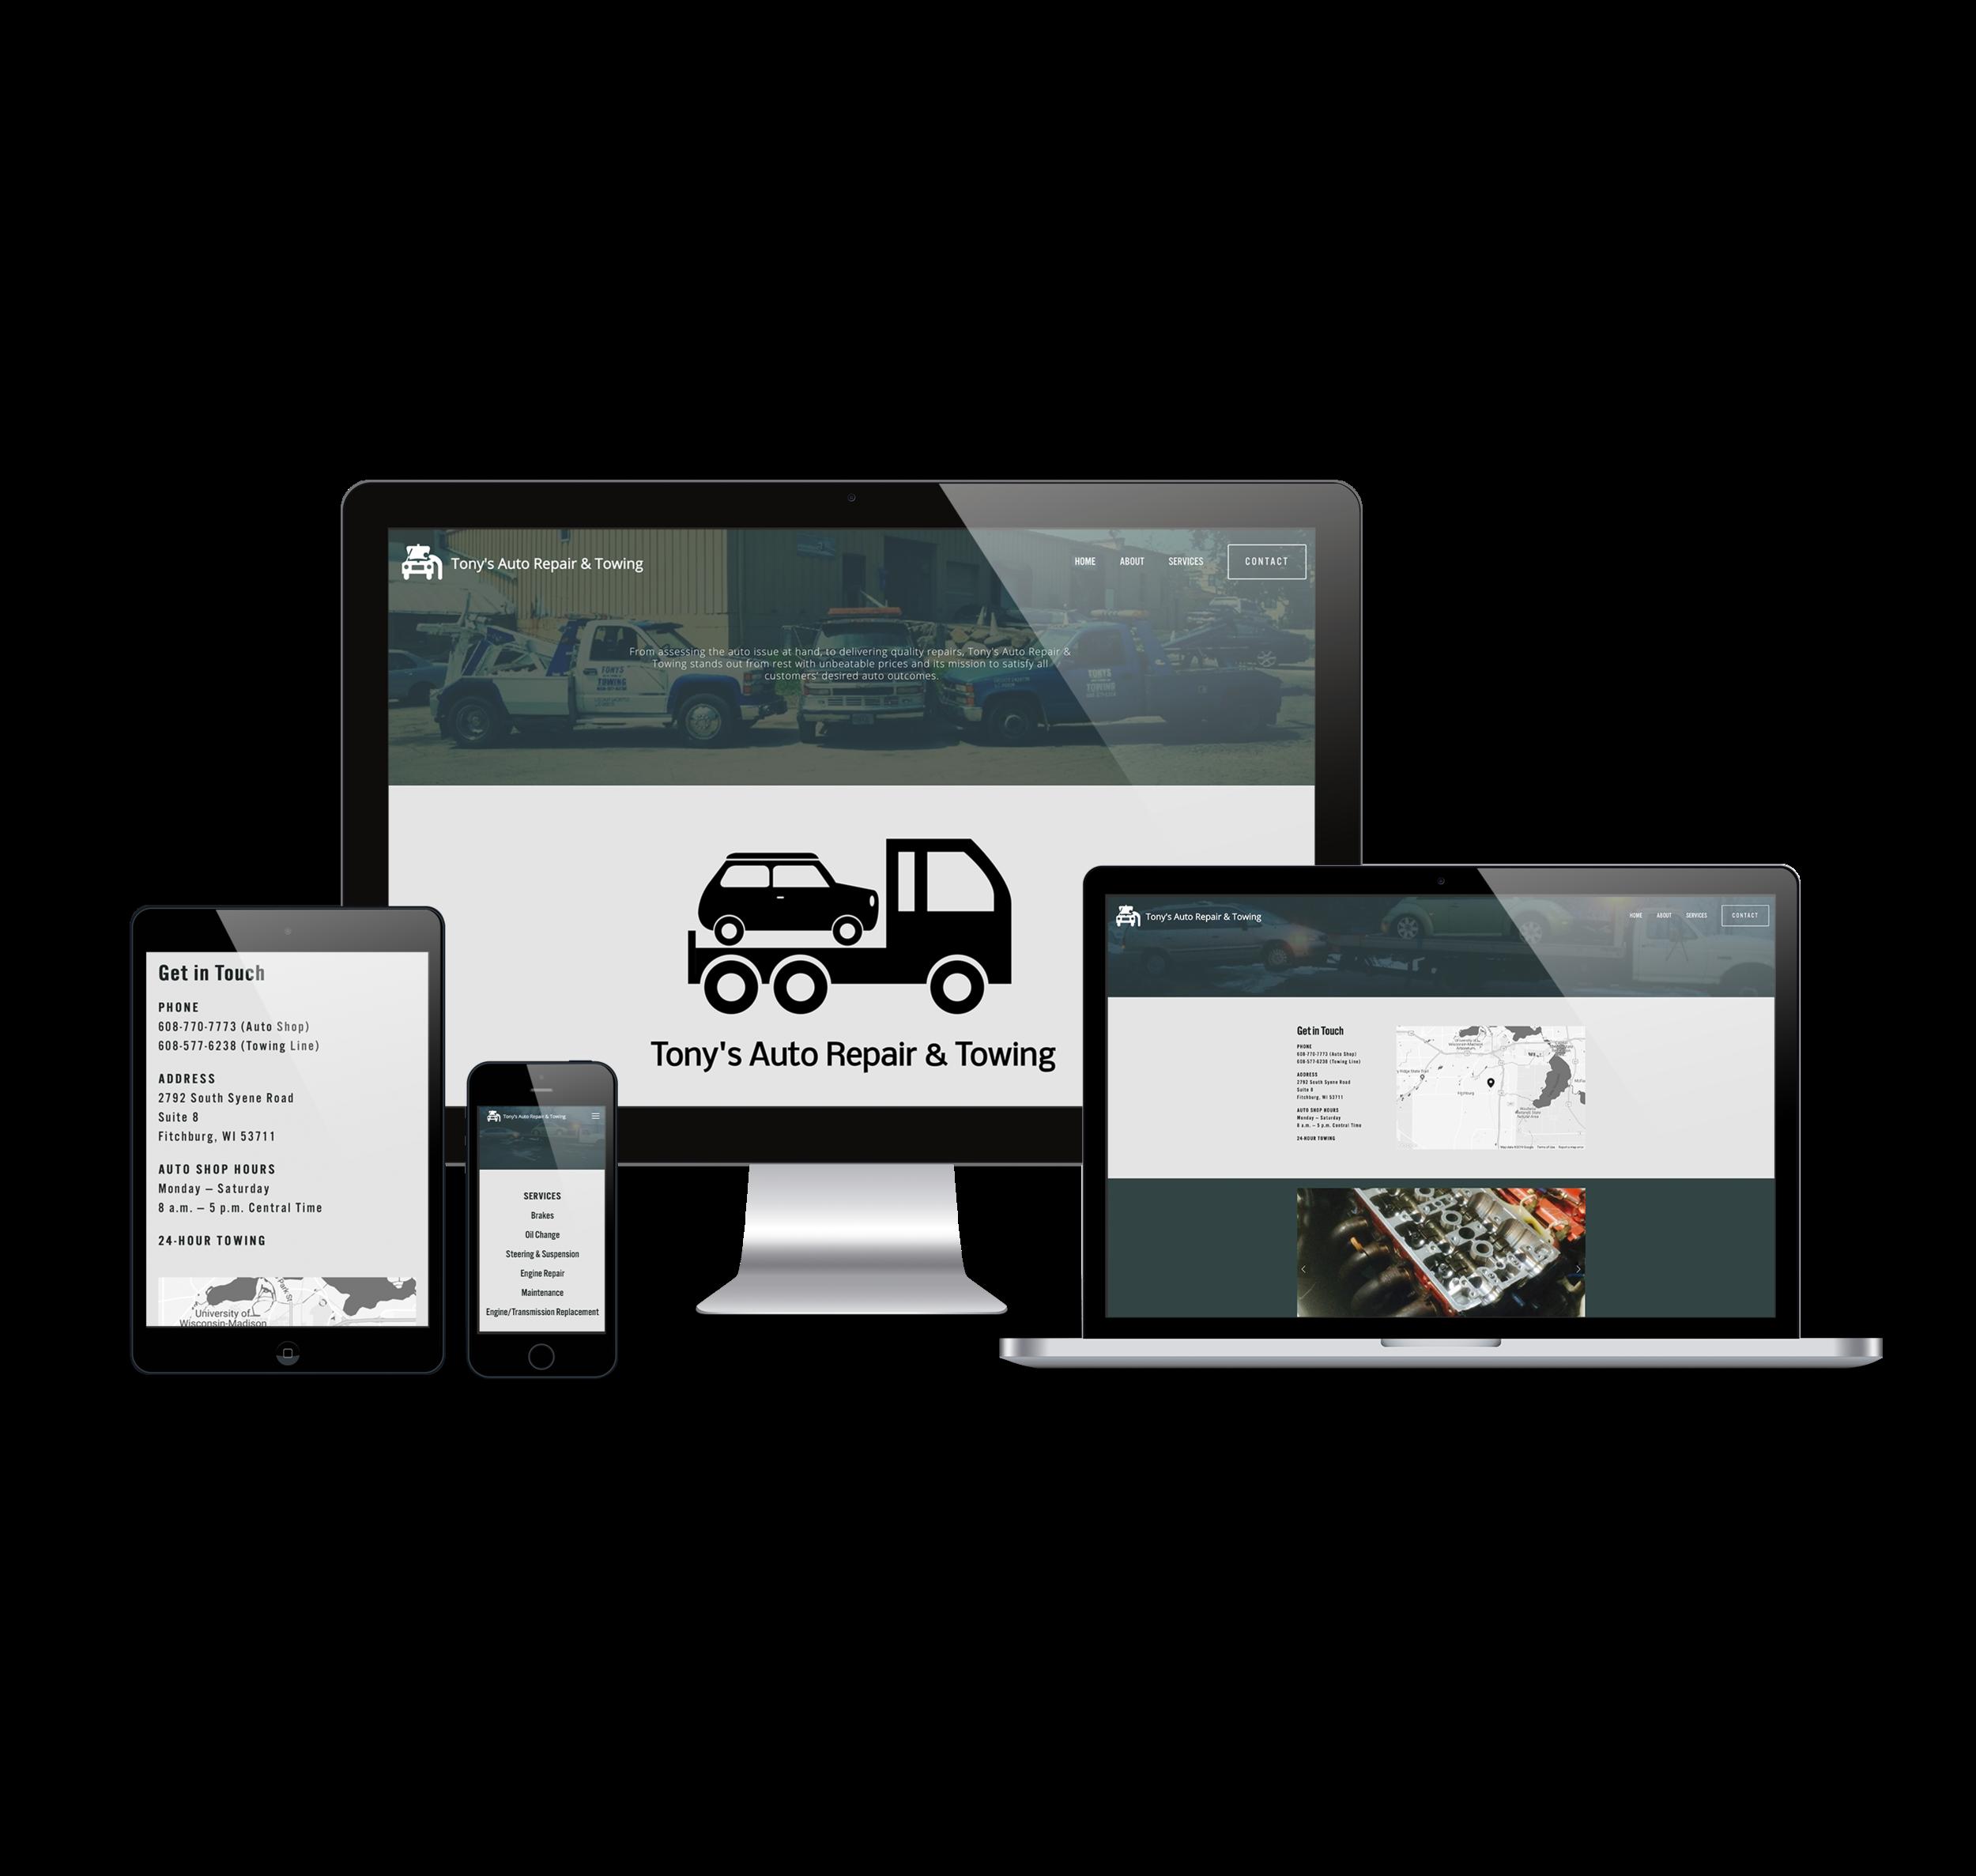 tonys-auto-shop-transparent.png